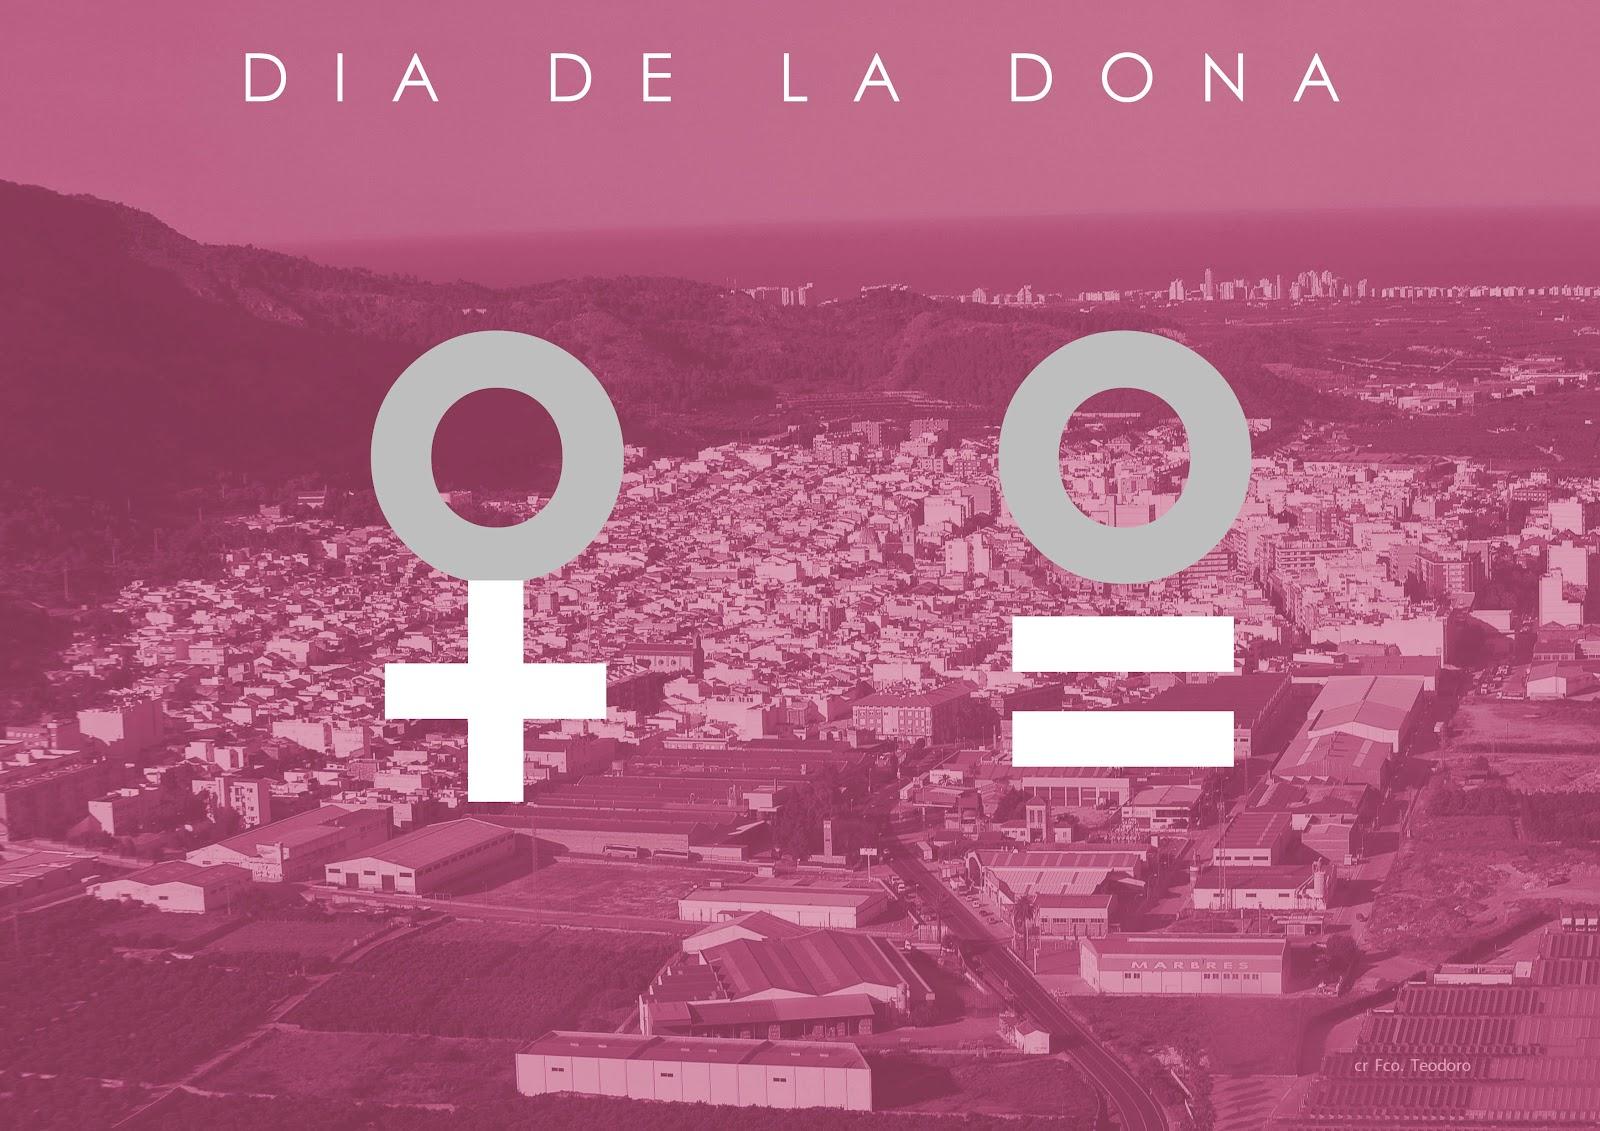 Cfa Anna Murià 8 De Març Dia De La Dona